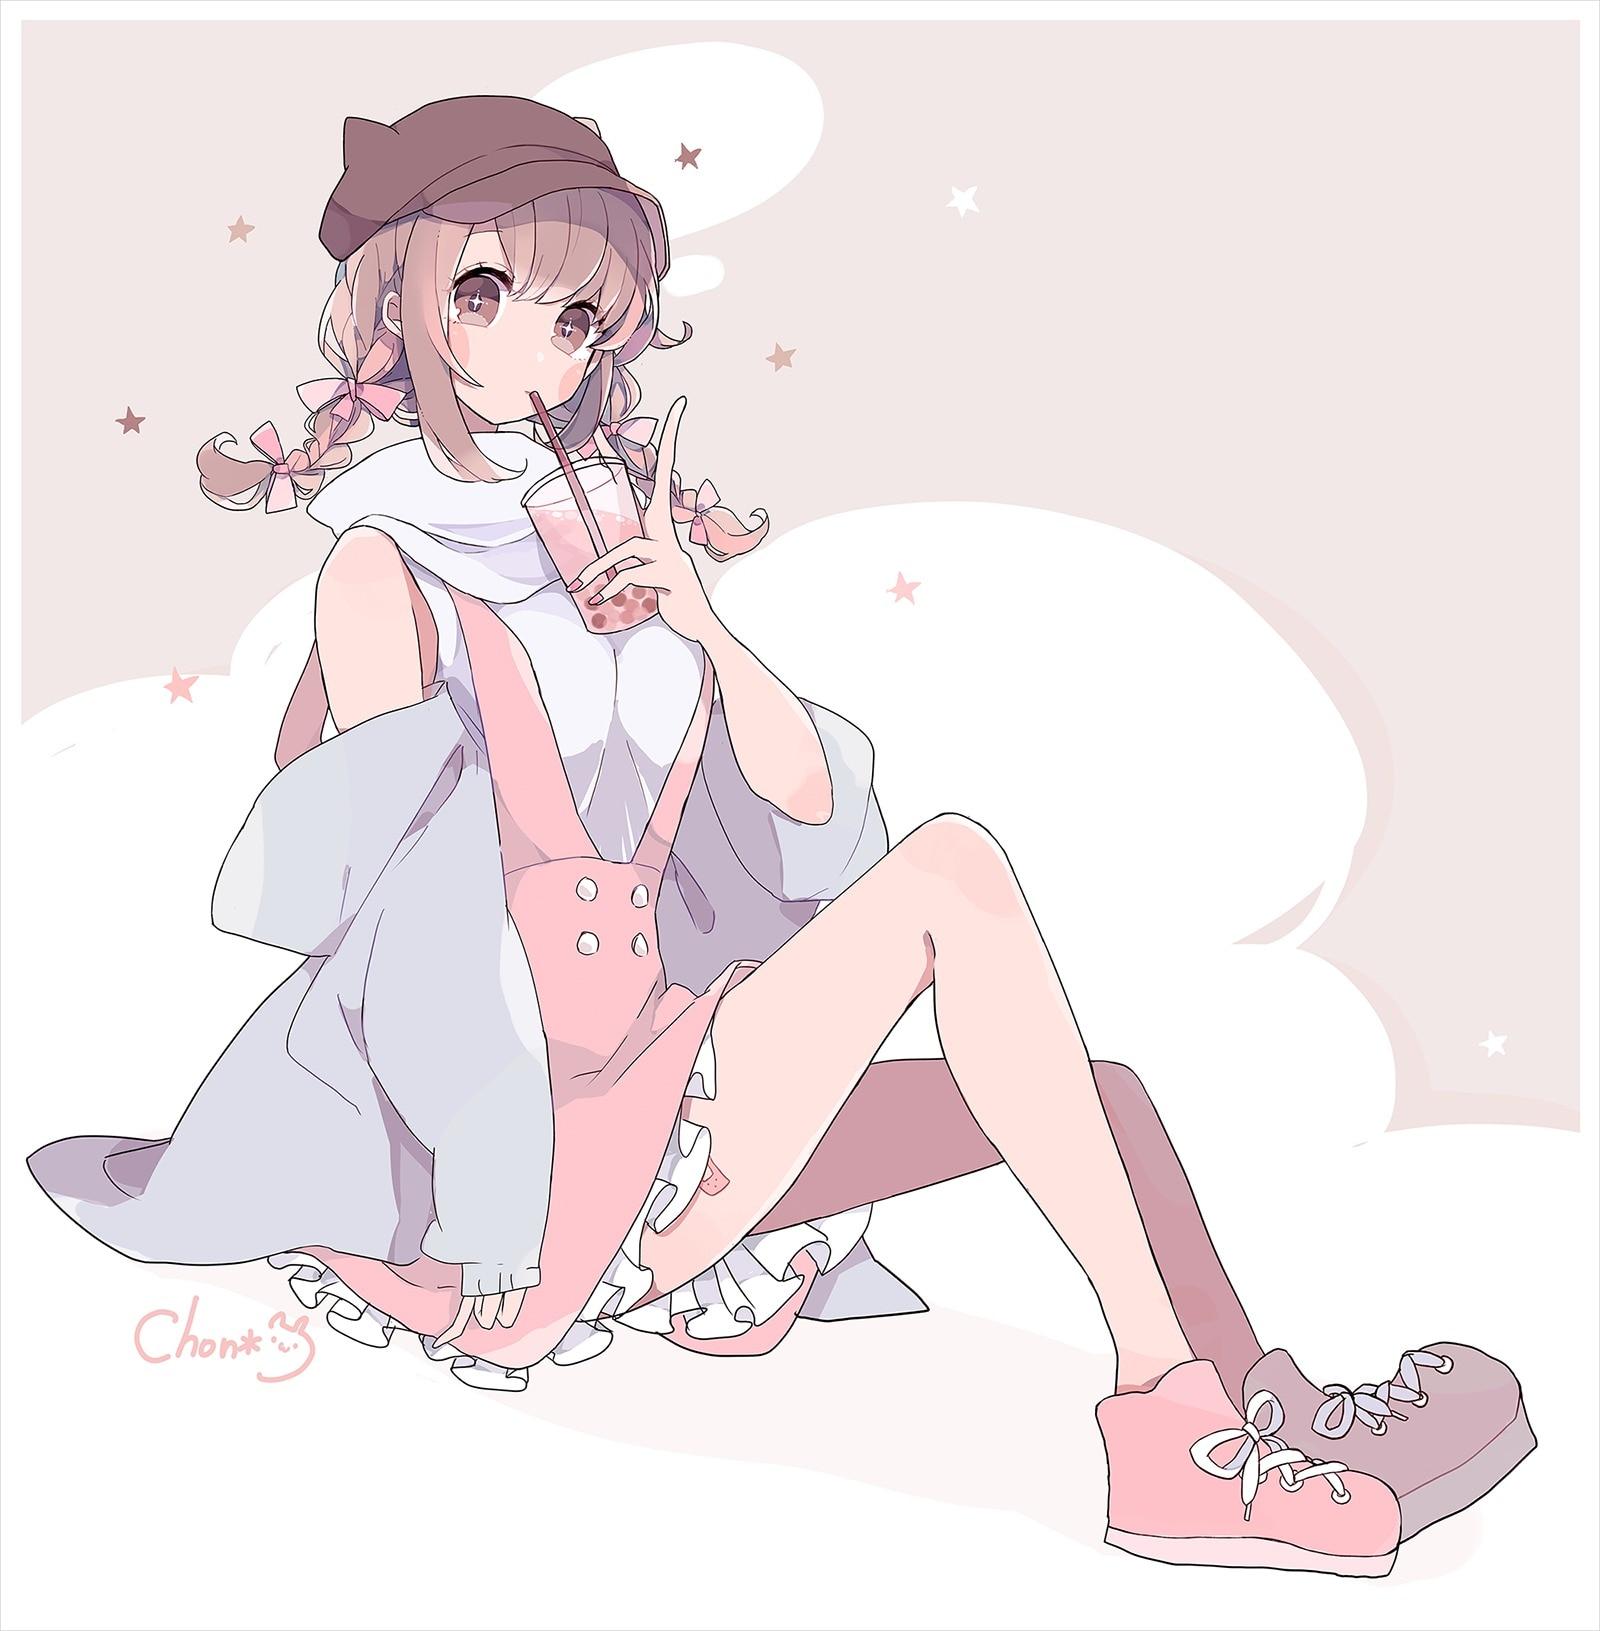 【P站画师】日本画师ちょん*的插画作品- ACG17.COM